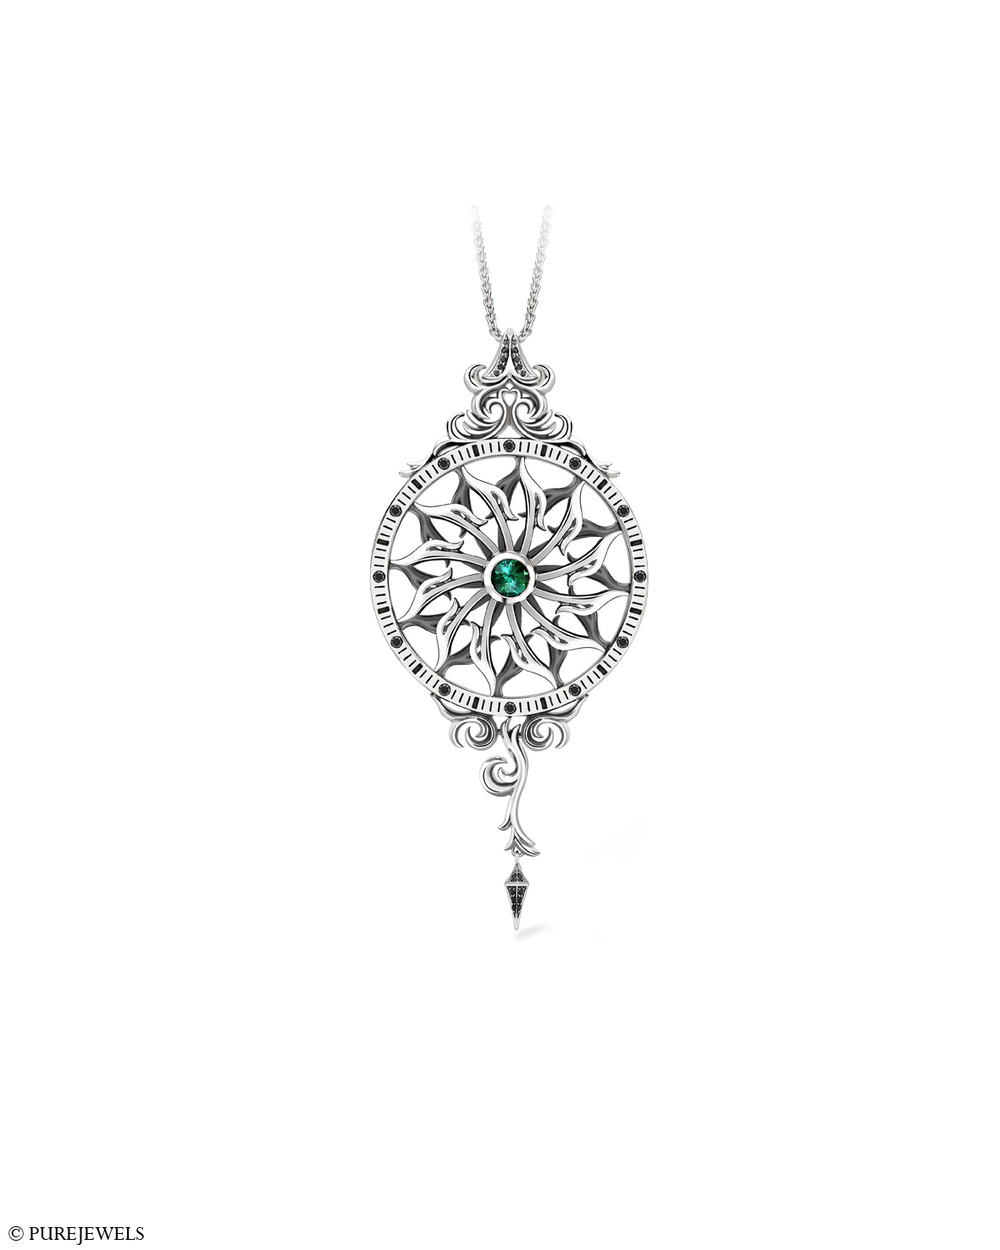 Lonmin Design Innovation Award Winning Spinning Pendant:  Platinum, black diamonds & tourmaline. Designed for  PureJewels .